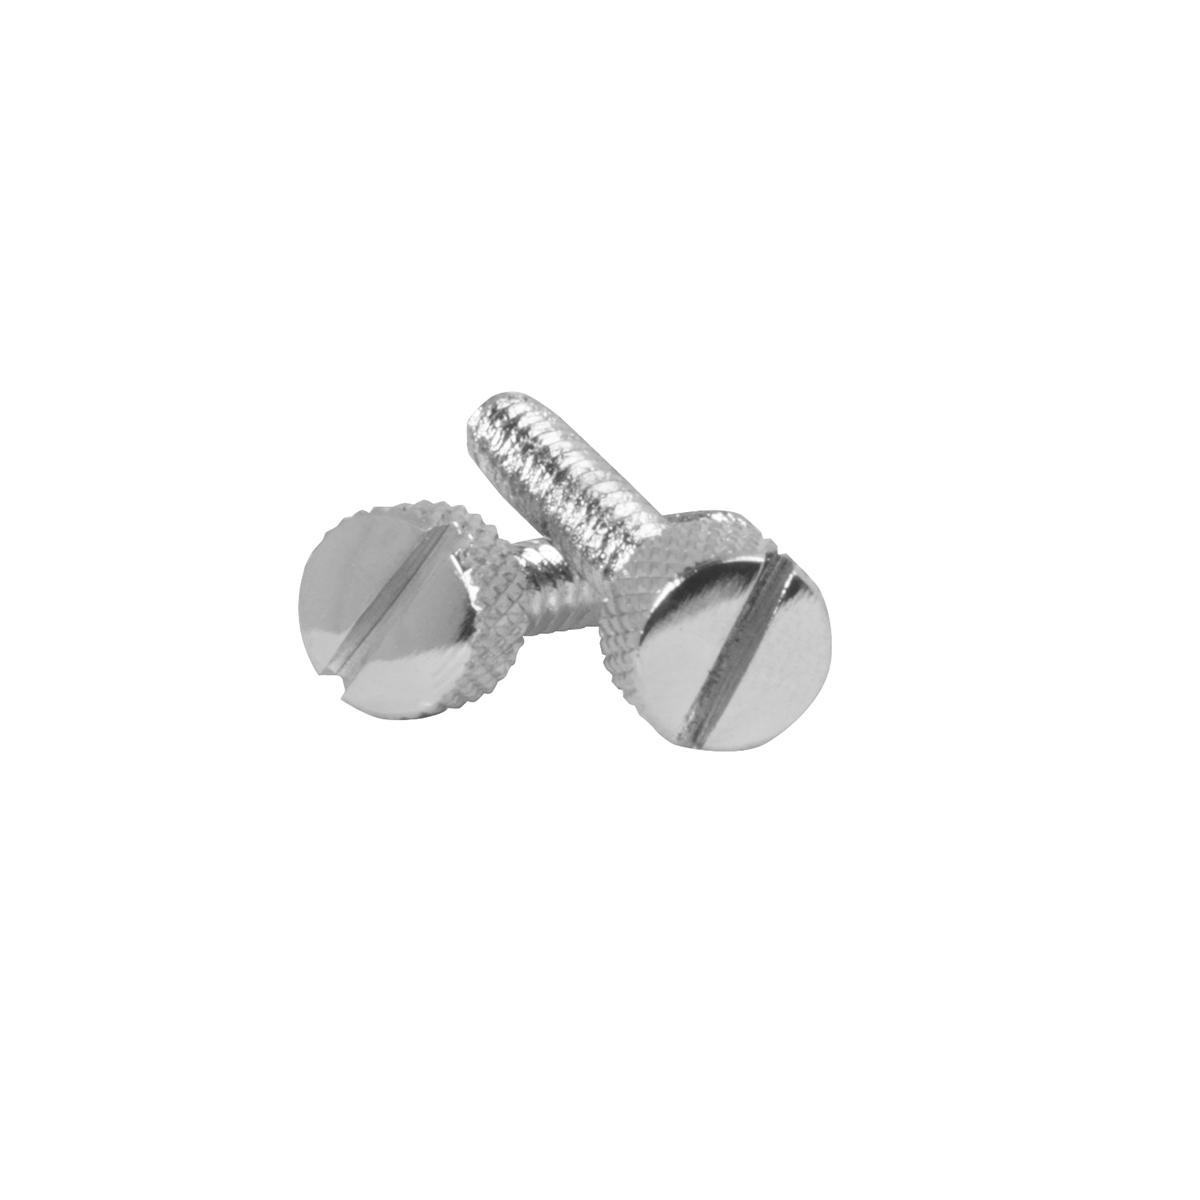 67168 FLT Chrome Steel Small Dash Screws